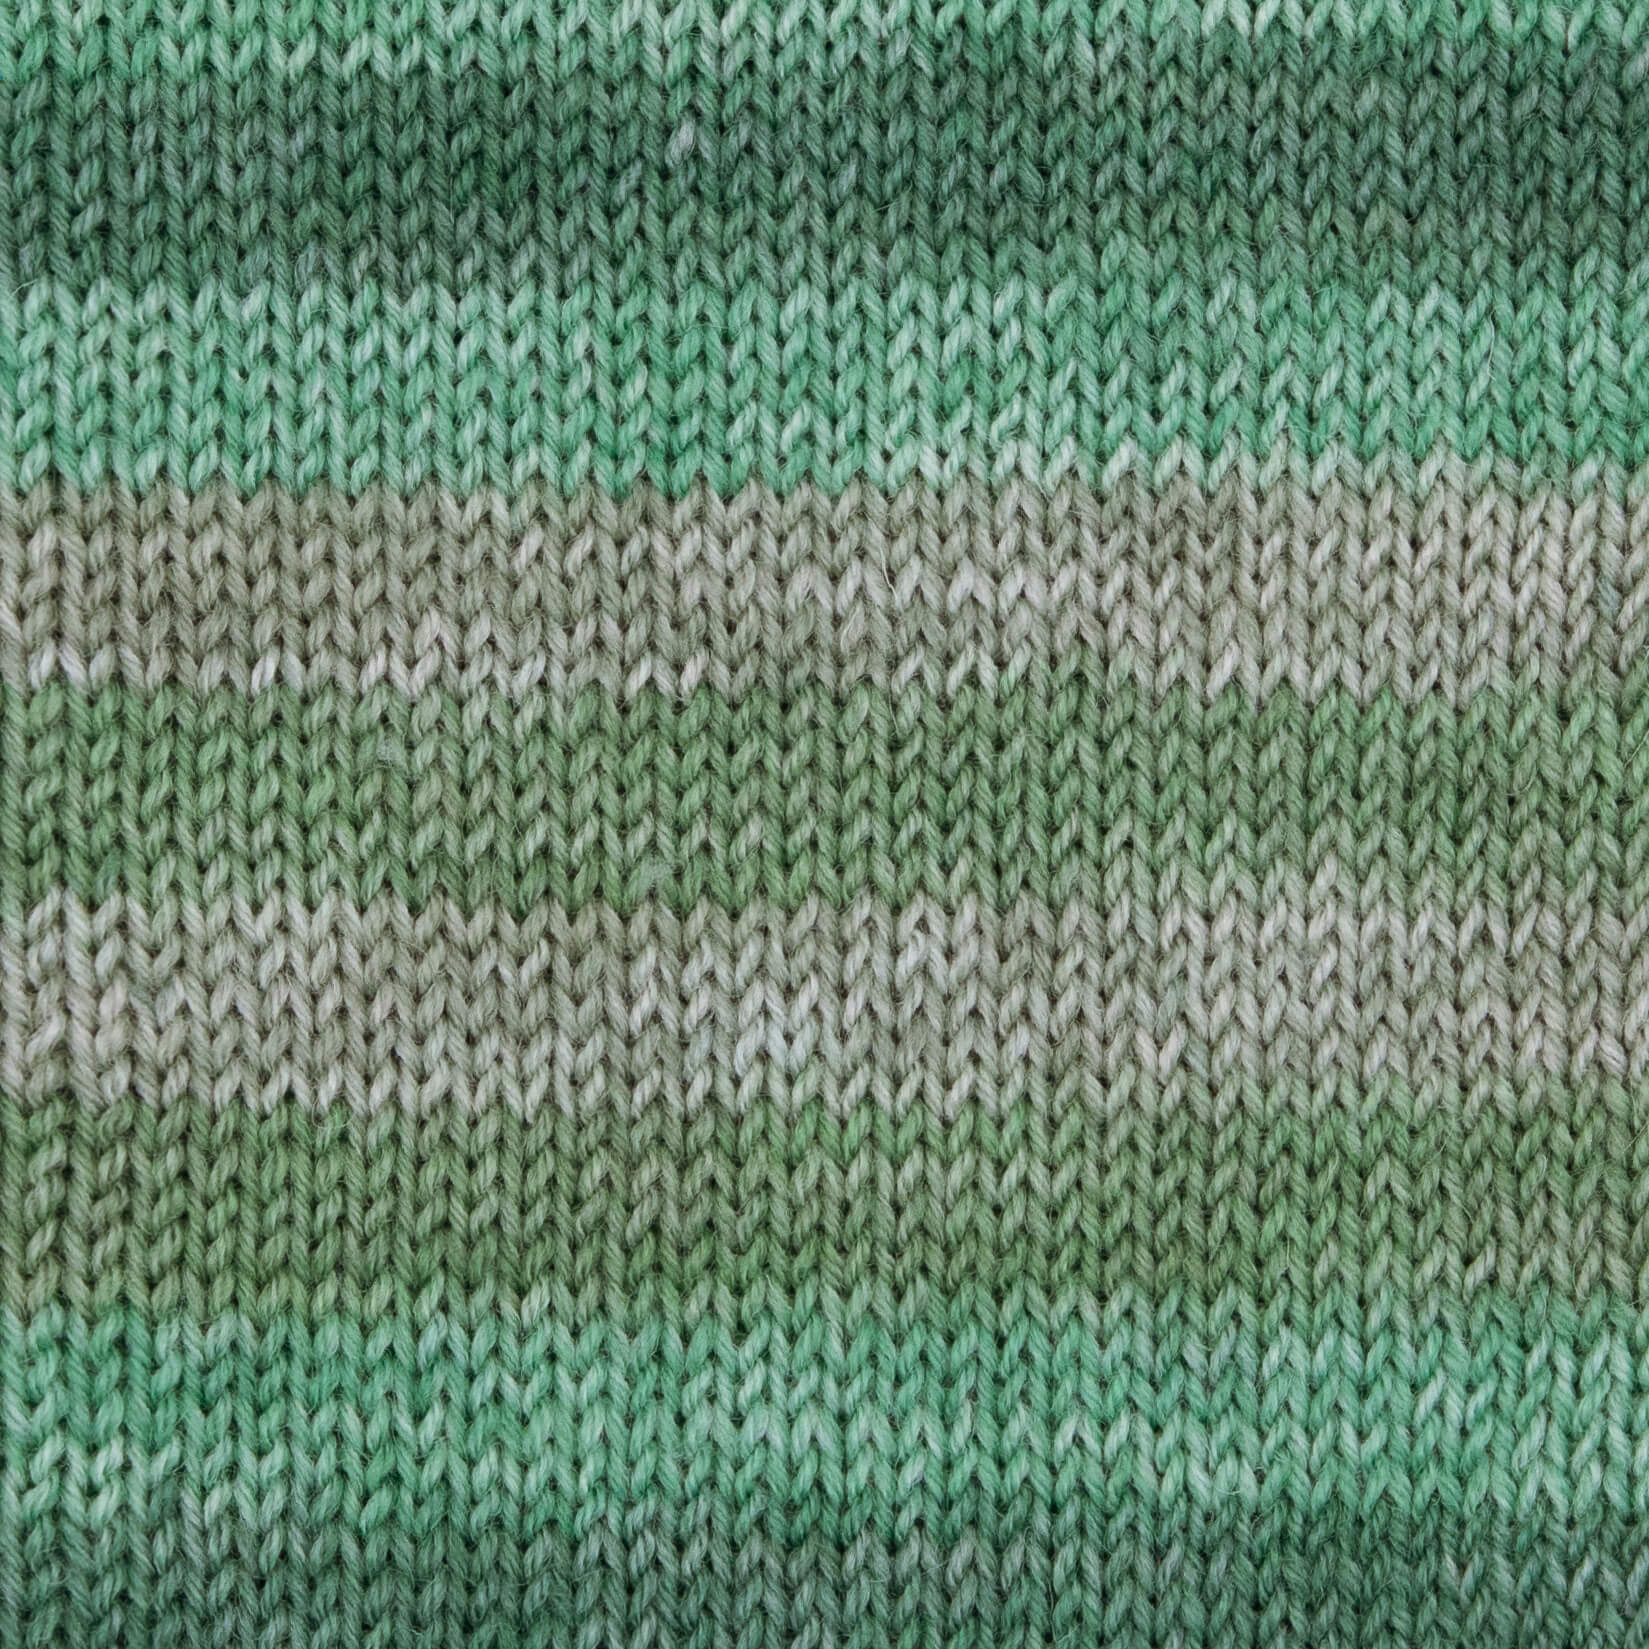 grün-moos-meliert